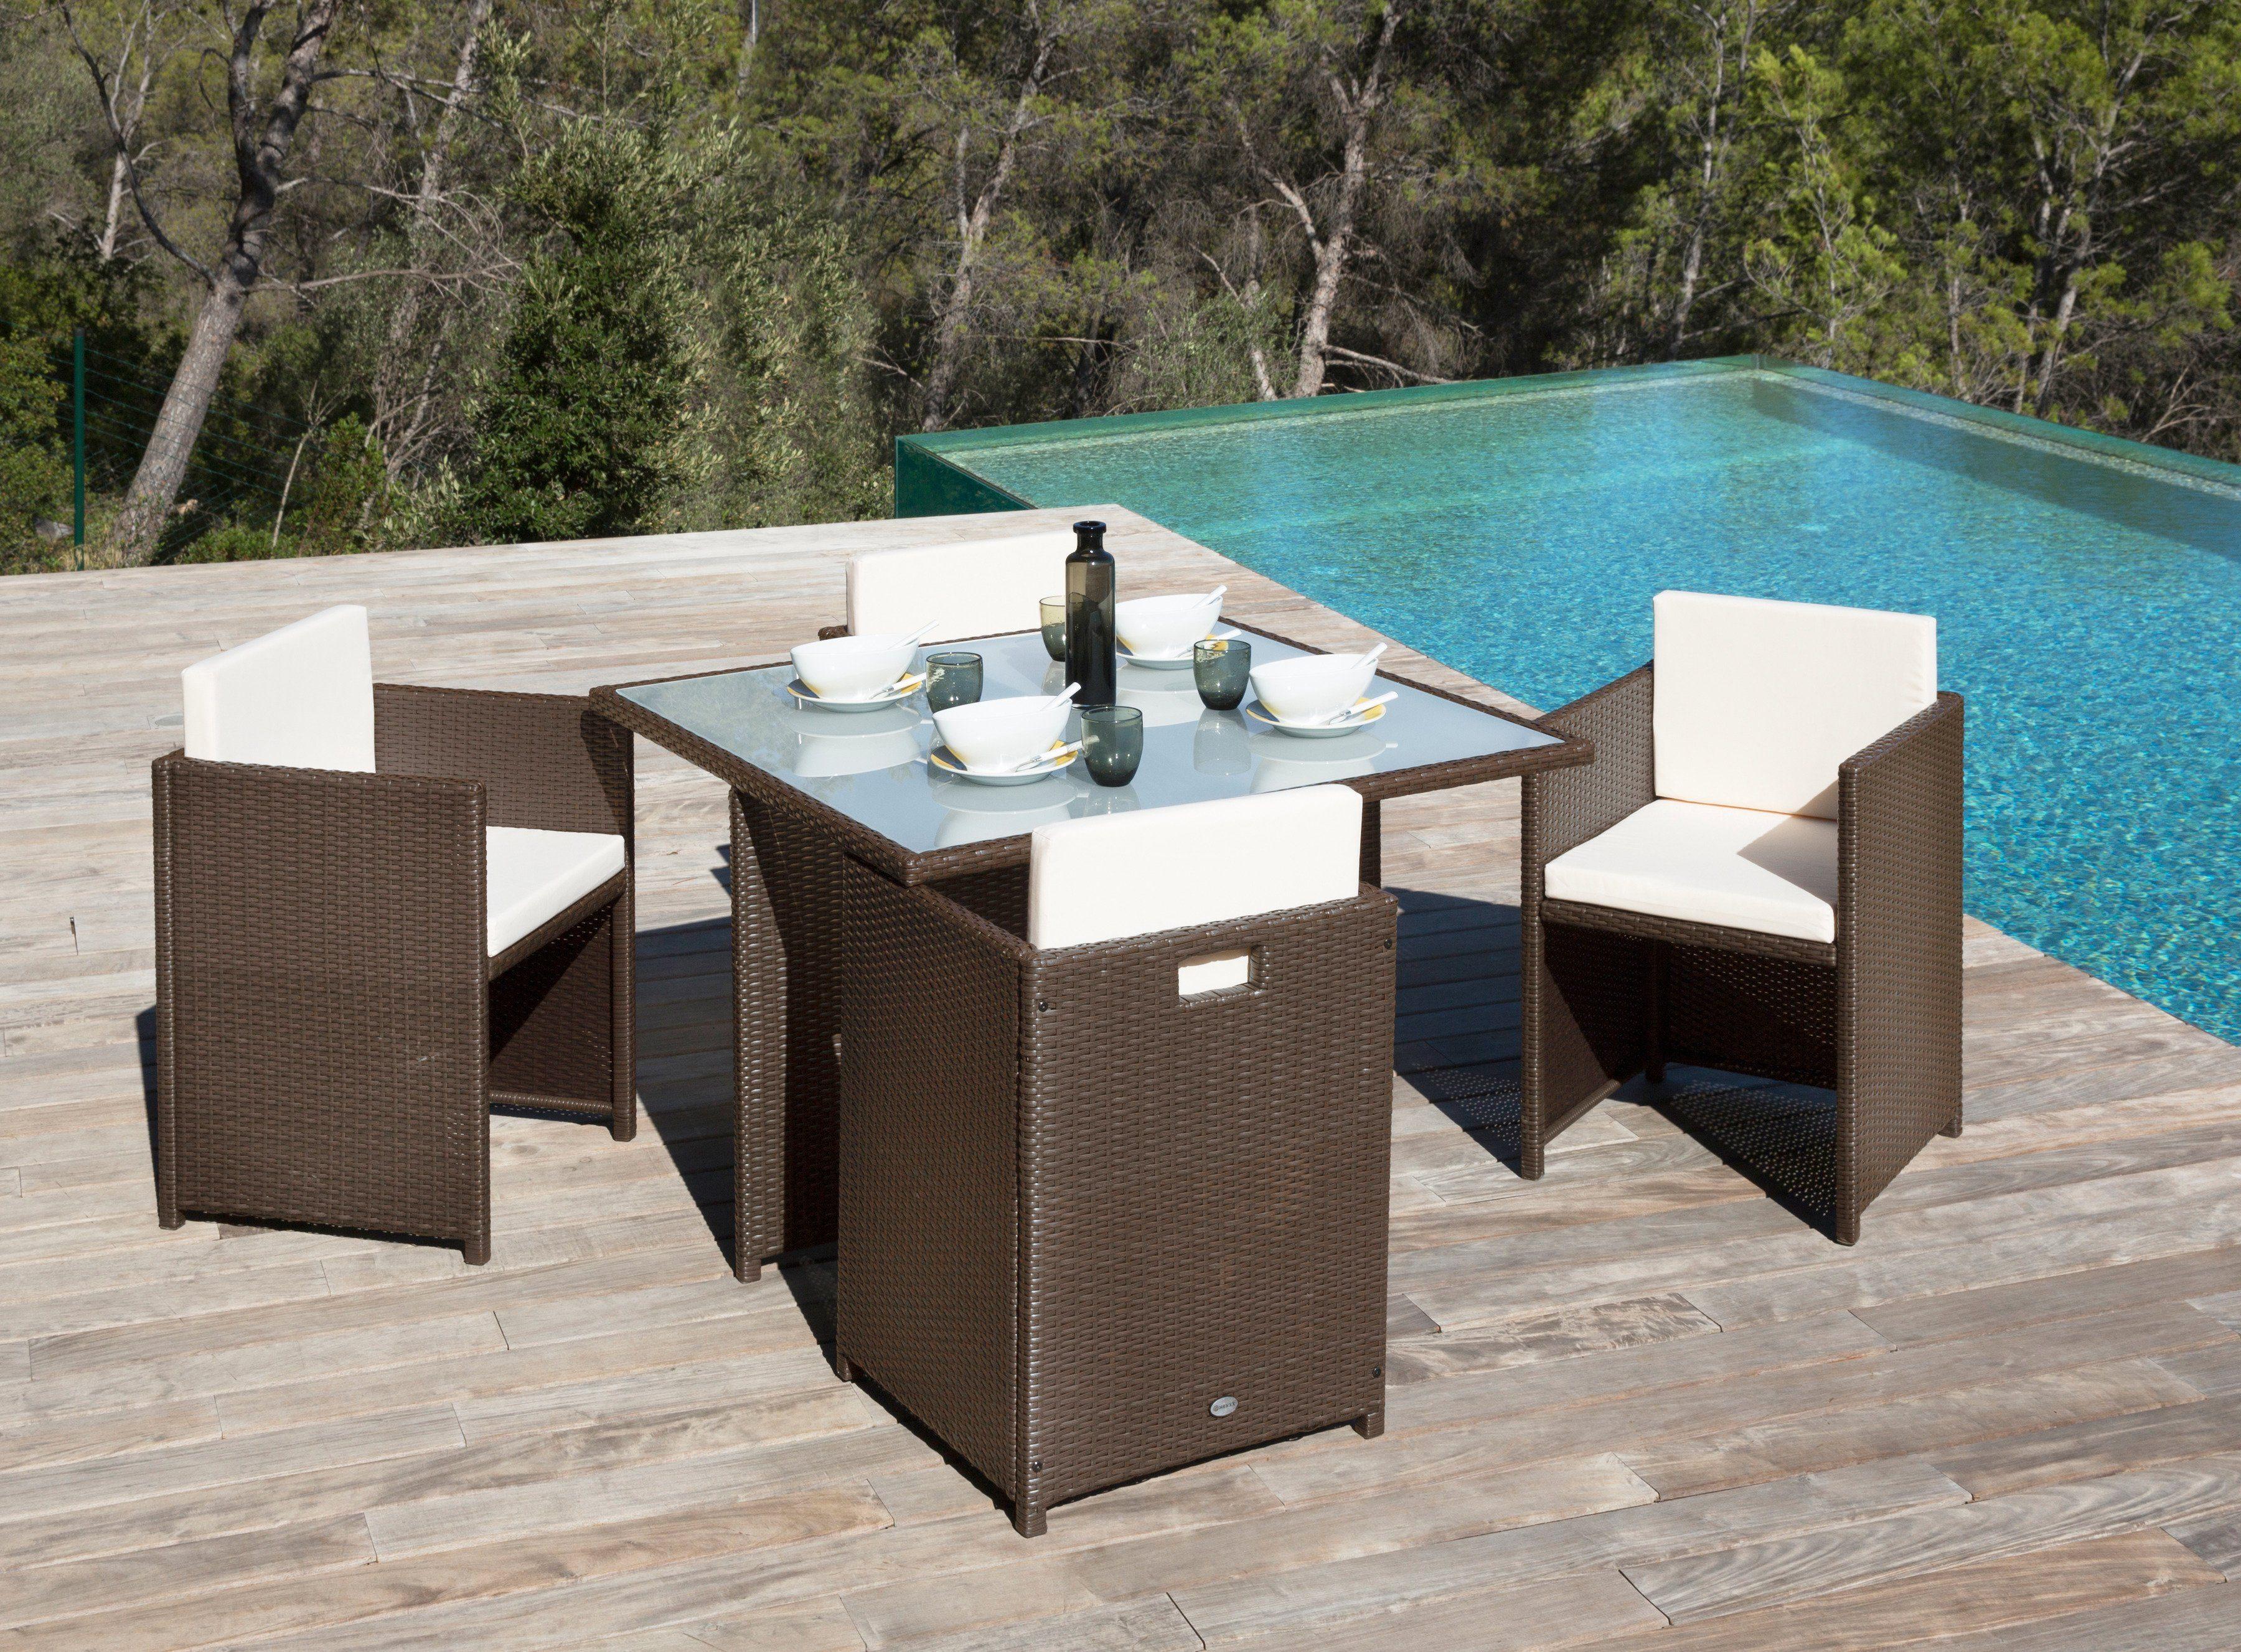 Gartenmöbelset »Verona«, 4 Sessel, Tisch 110x110 cm, Polyrattan, braun